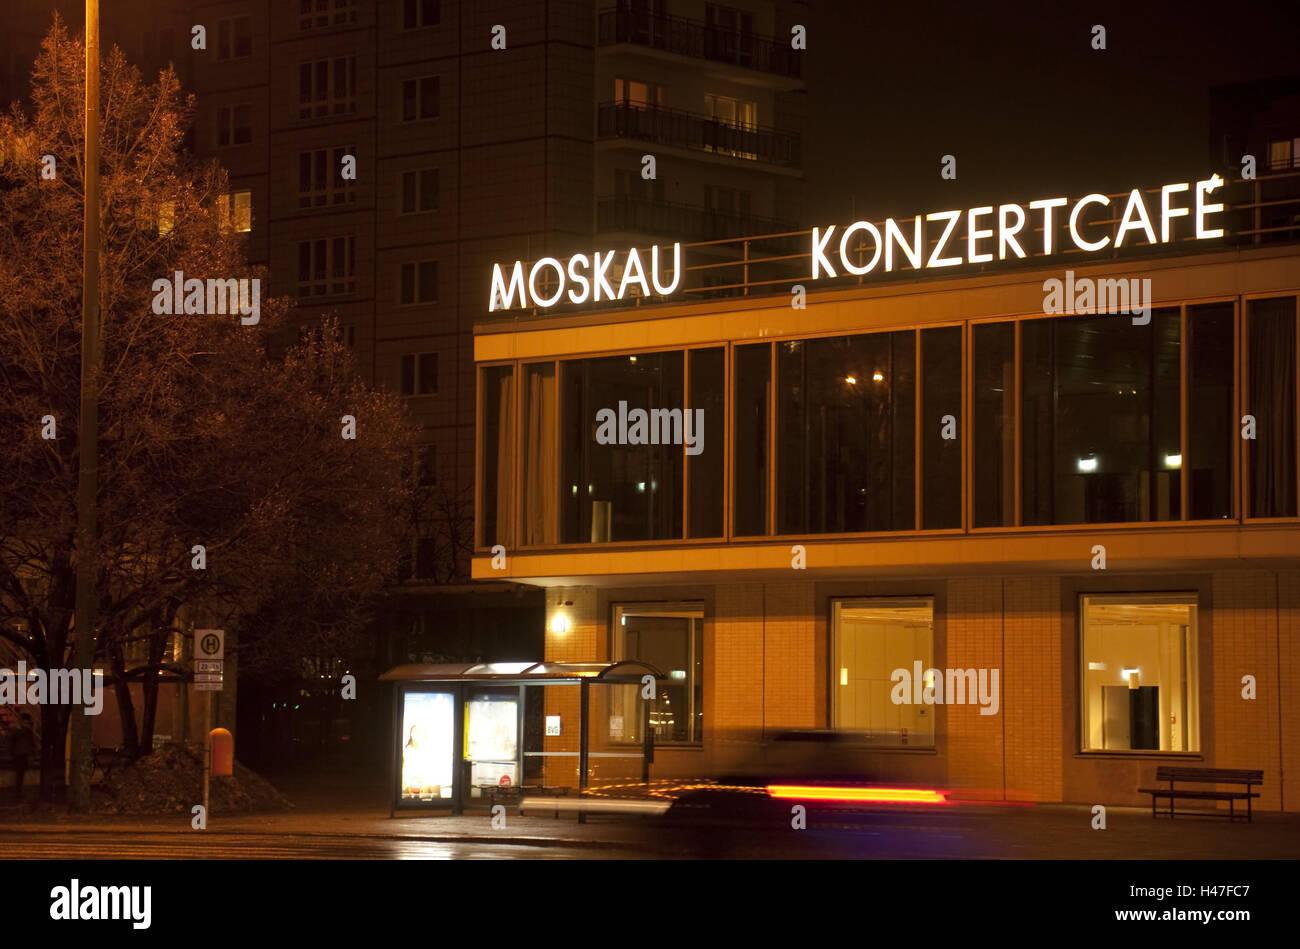 Germania berlino mosca concerto cafe notte architettura all